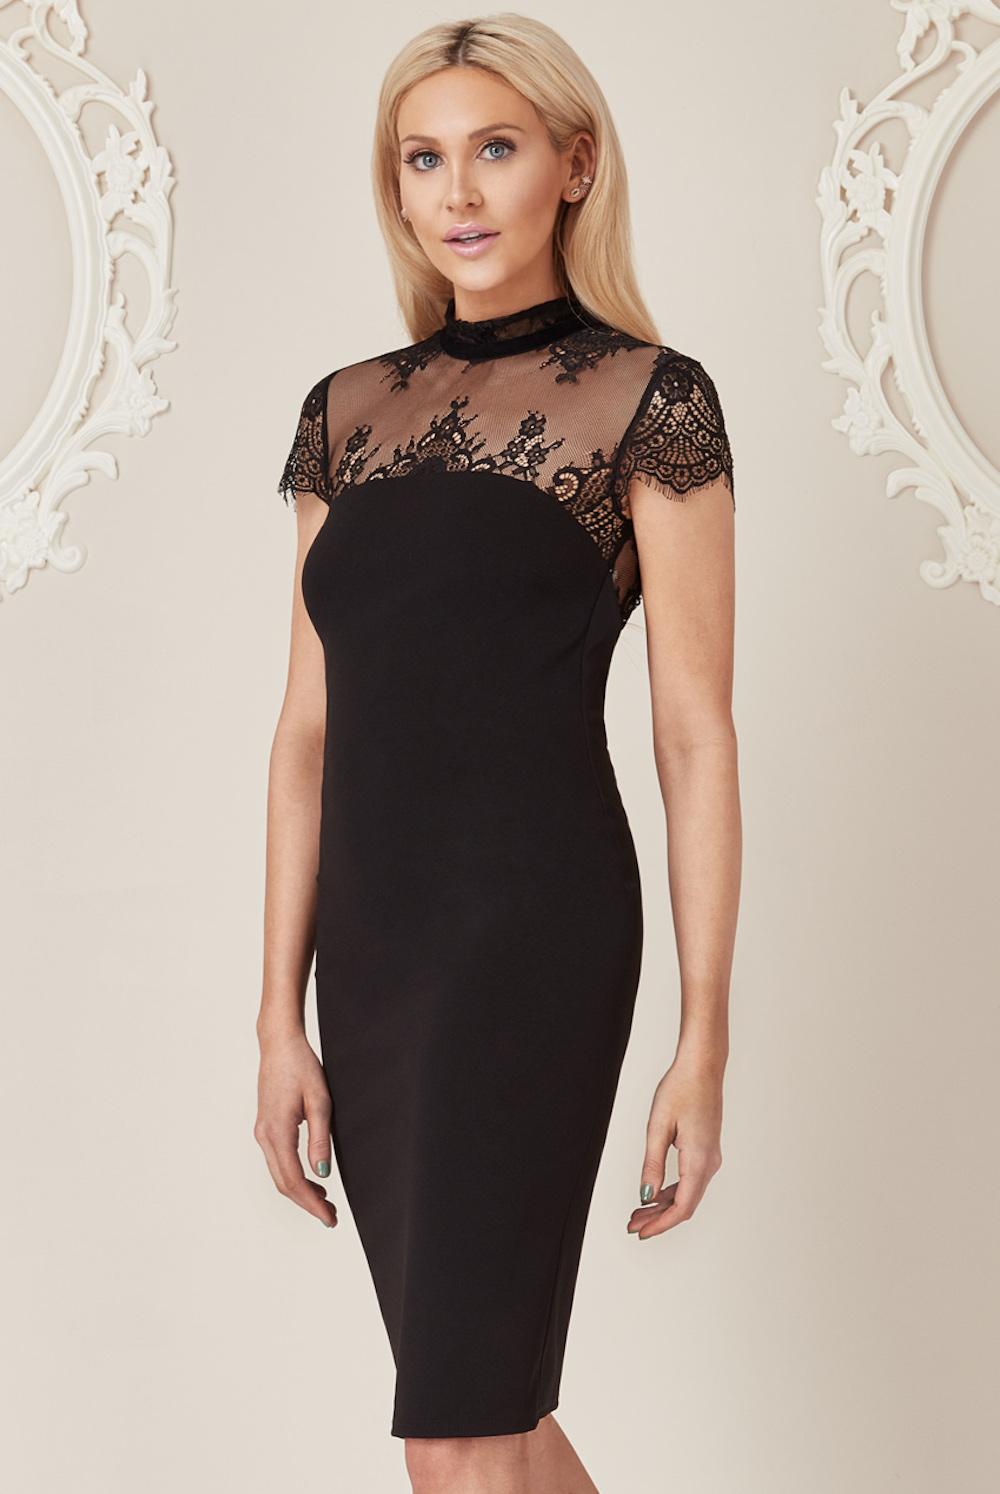 b05af9a9089 ... Stephanie Pratt For Goddiva Lace Back Dress Black